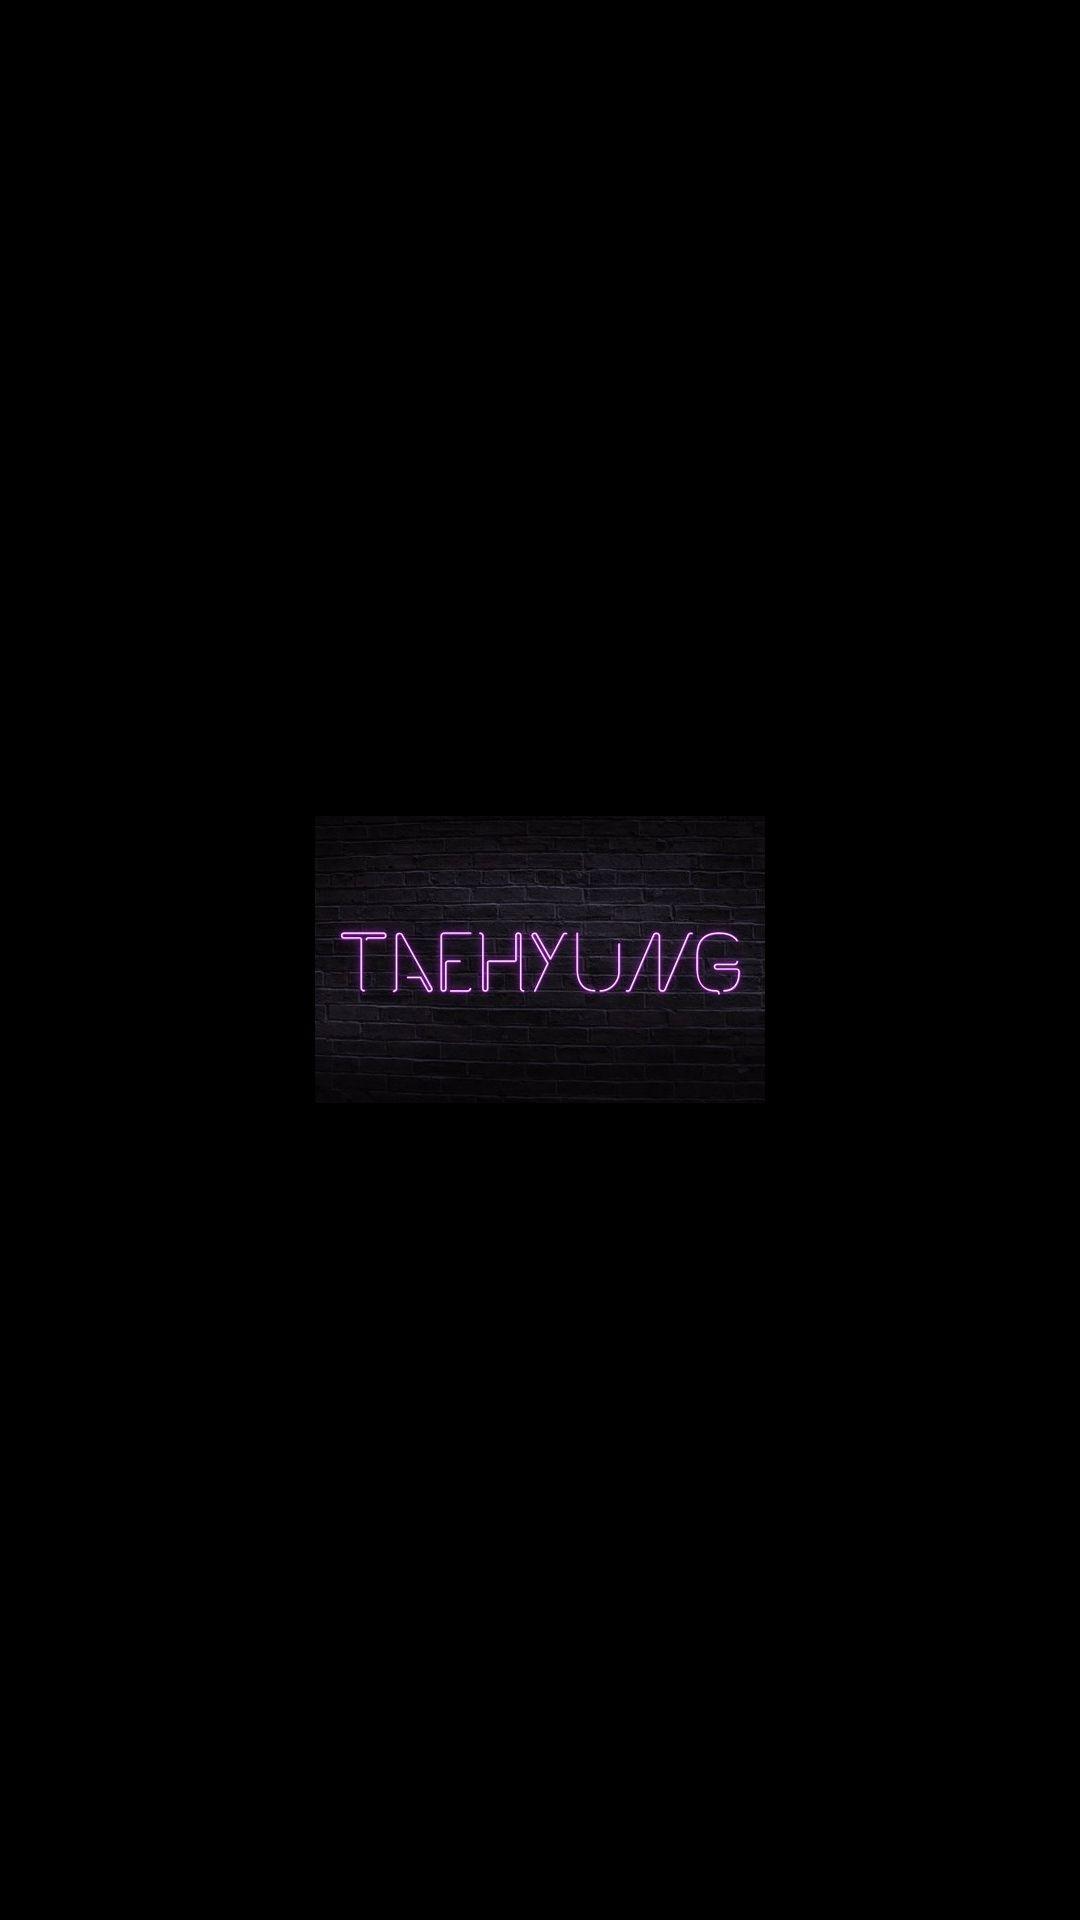 Kim taehyung iphone wallpaper tumblr - Coups De C Ur Tumblr